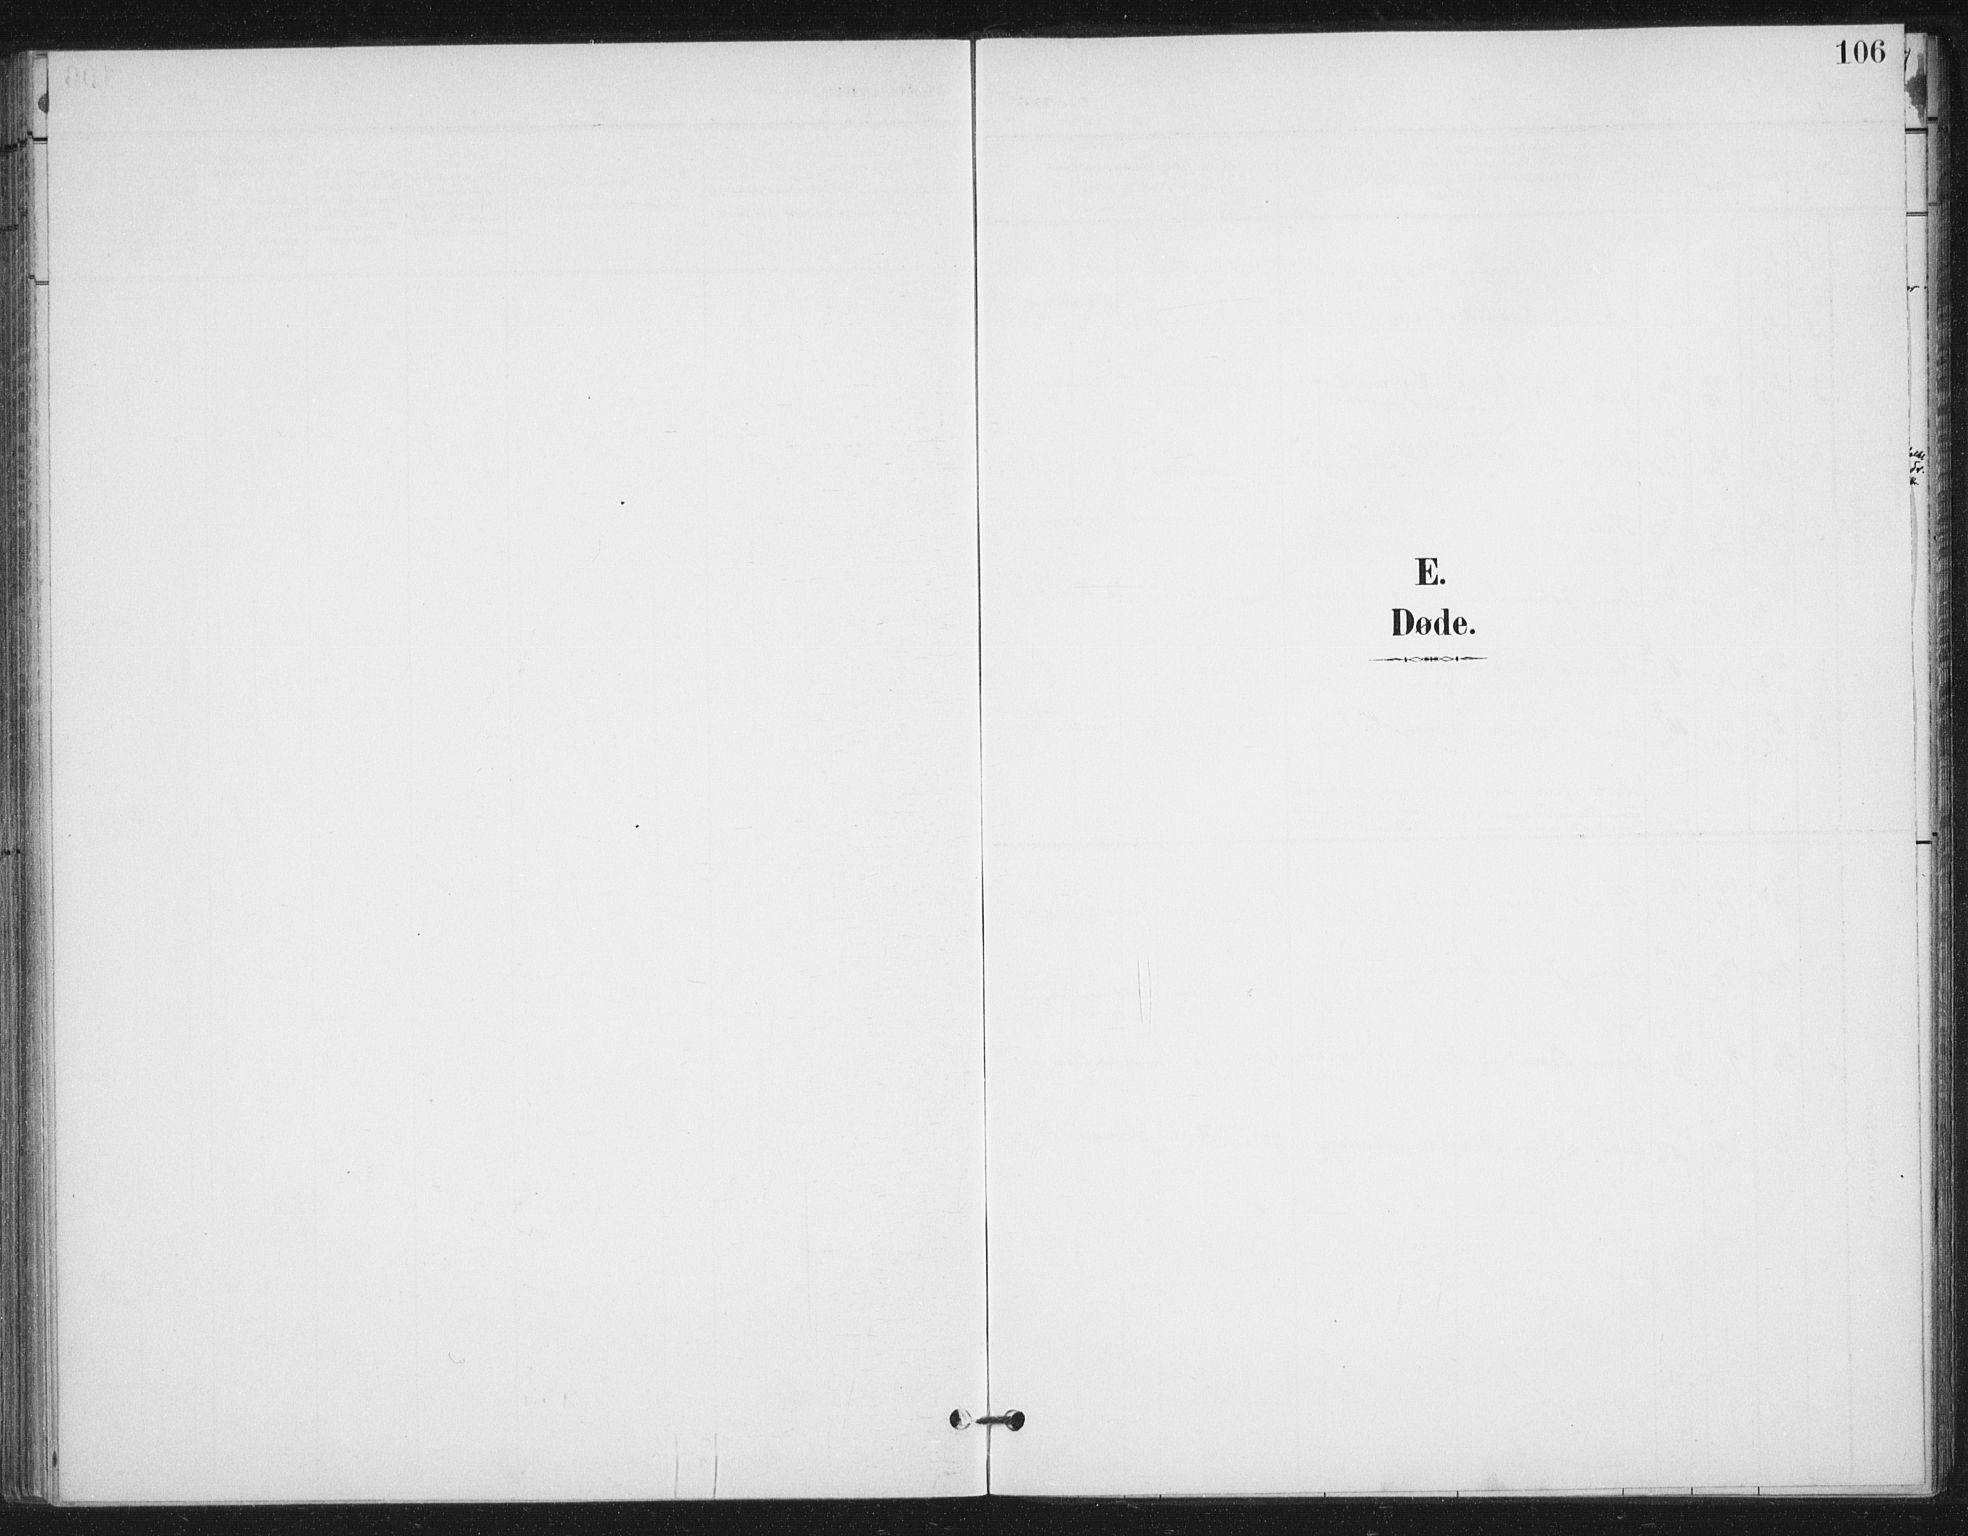 SAT, Ministerialprotokoller, klokkerbøker og fødselsregistre - Nordland, 894/L1356: Ministerialbok nr. 894A02, 1897-1914, s. 106